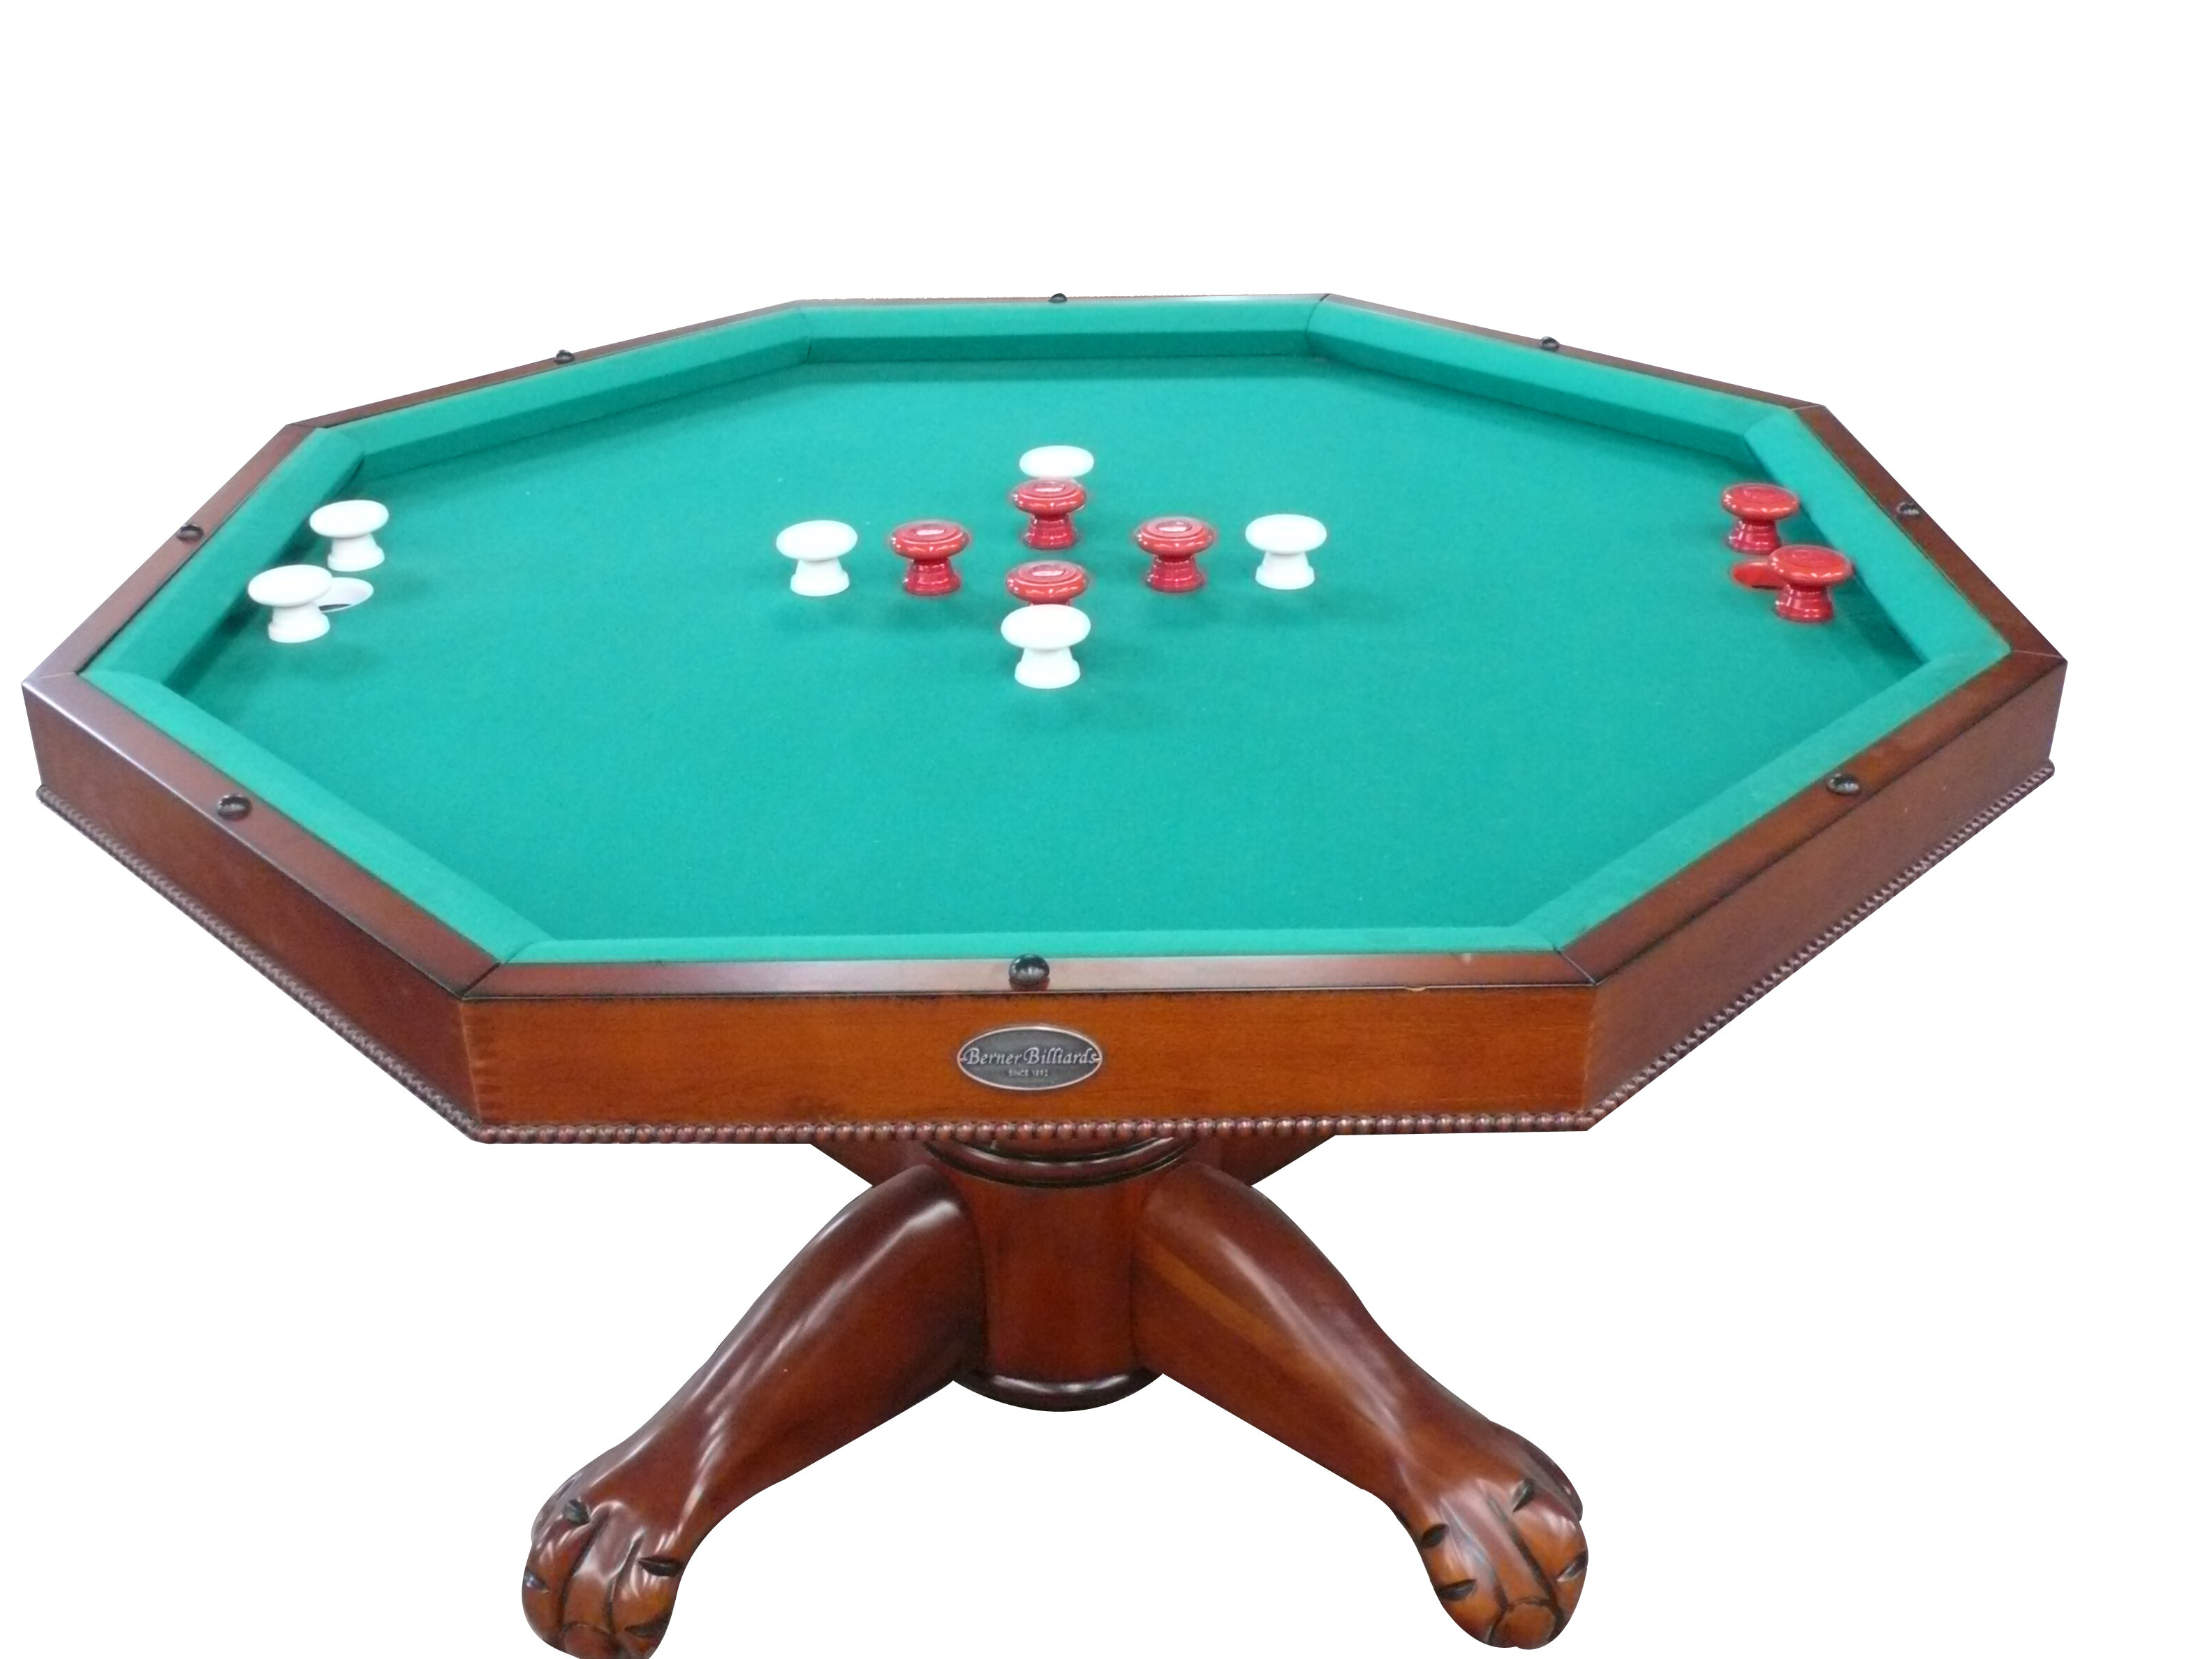 Berner Billiards 3 in 1 Game Table   Wayfair